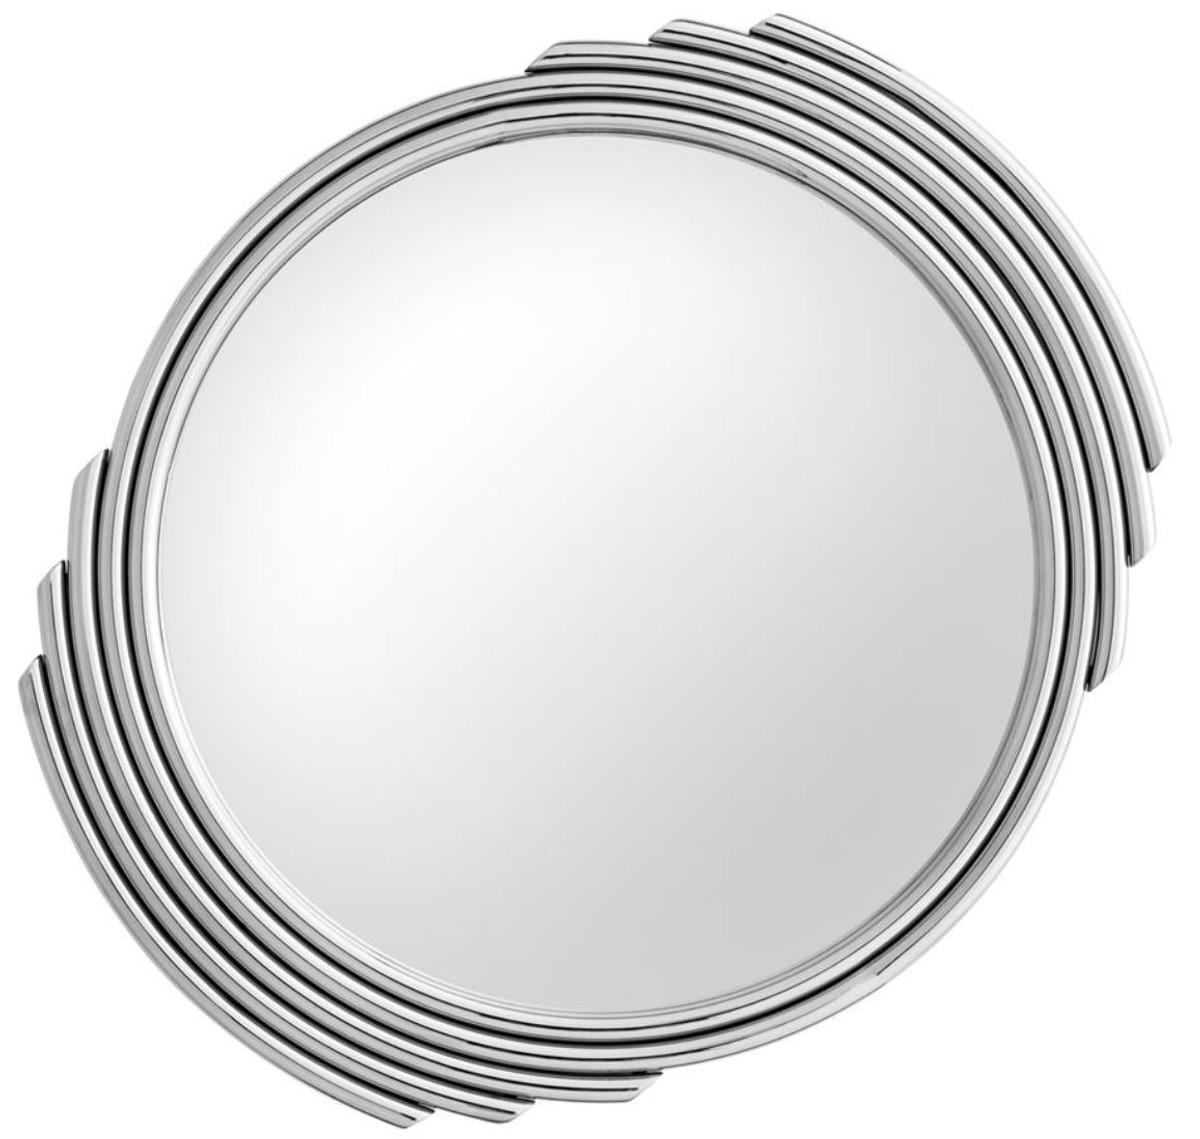 Casa Padrino Designer Edelstahl Spiegel Silber O 100 Cm Luxus